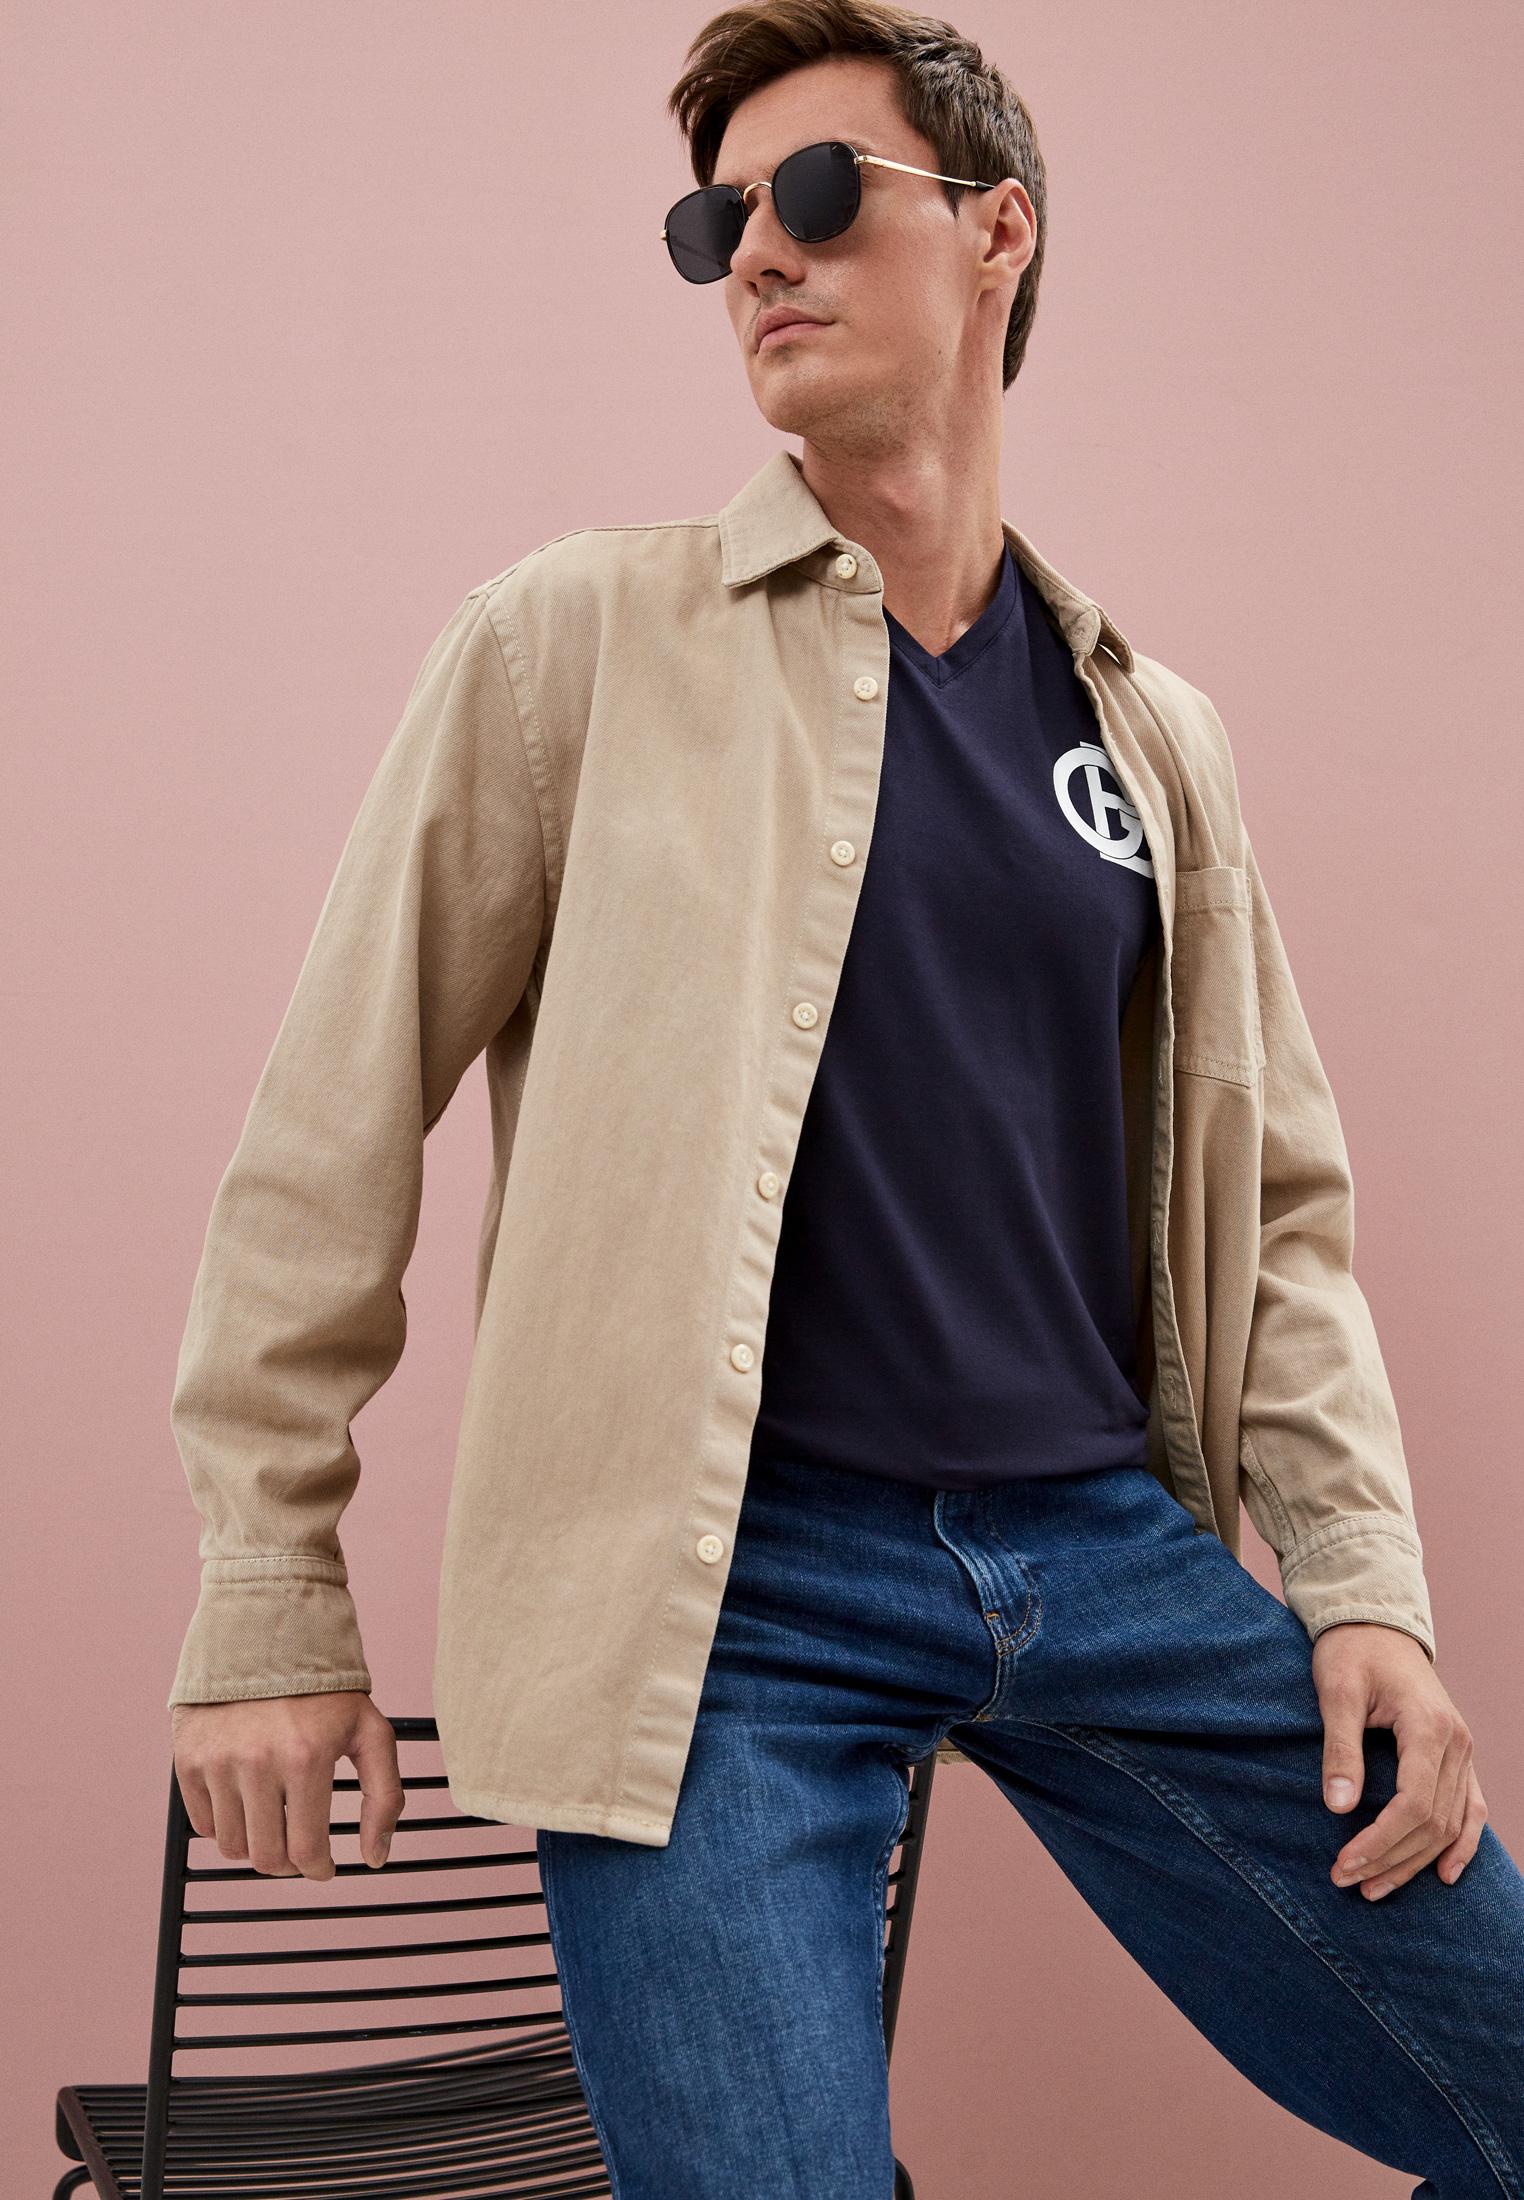 Мужская футболка Baldinini (Балдинини) TSU02: изображение 2